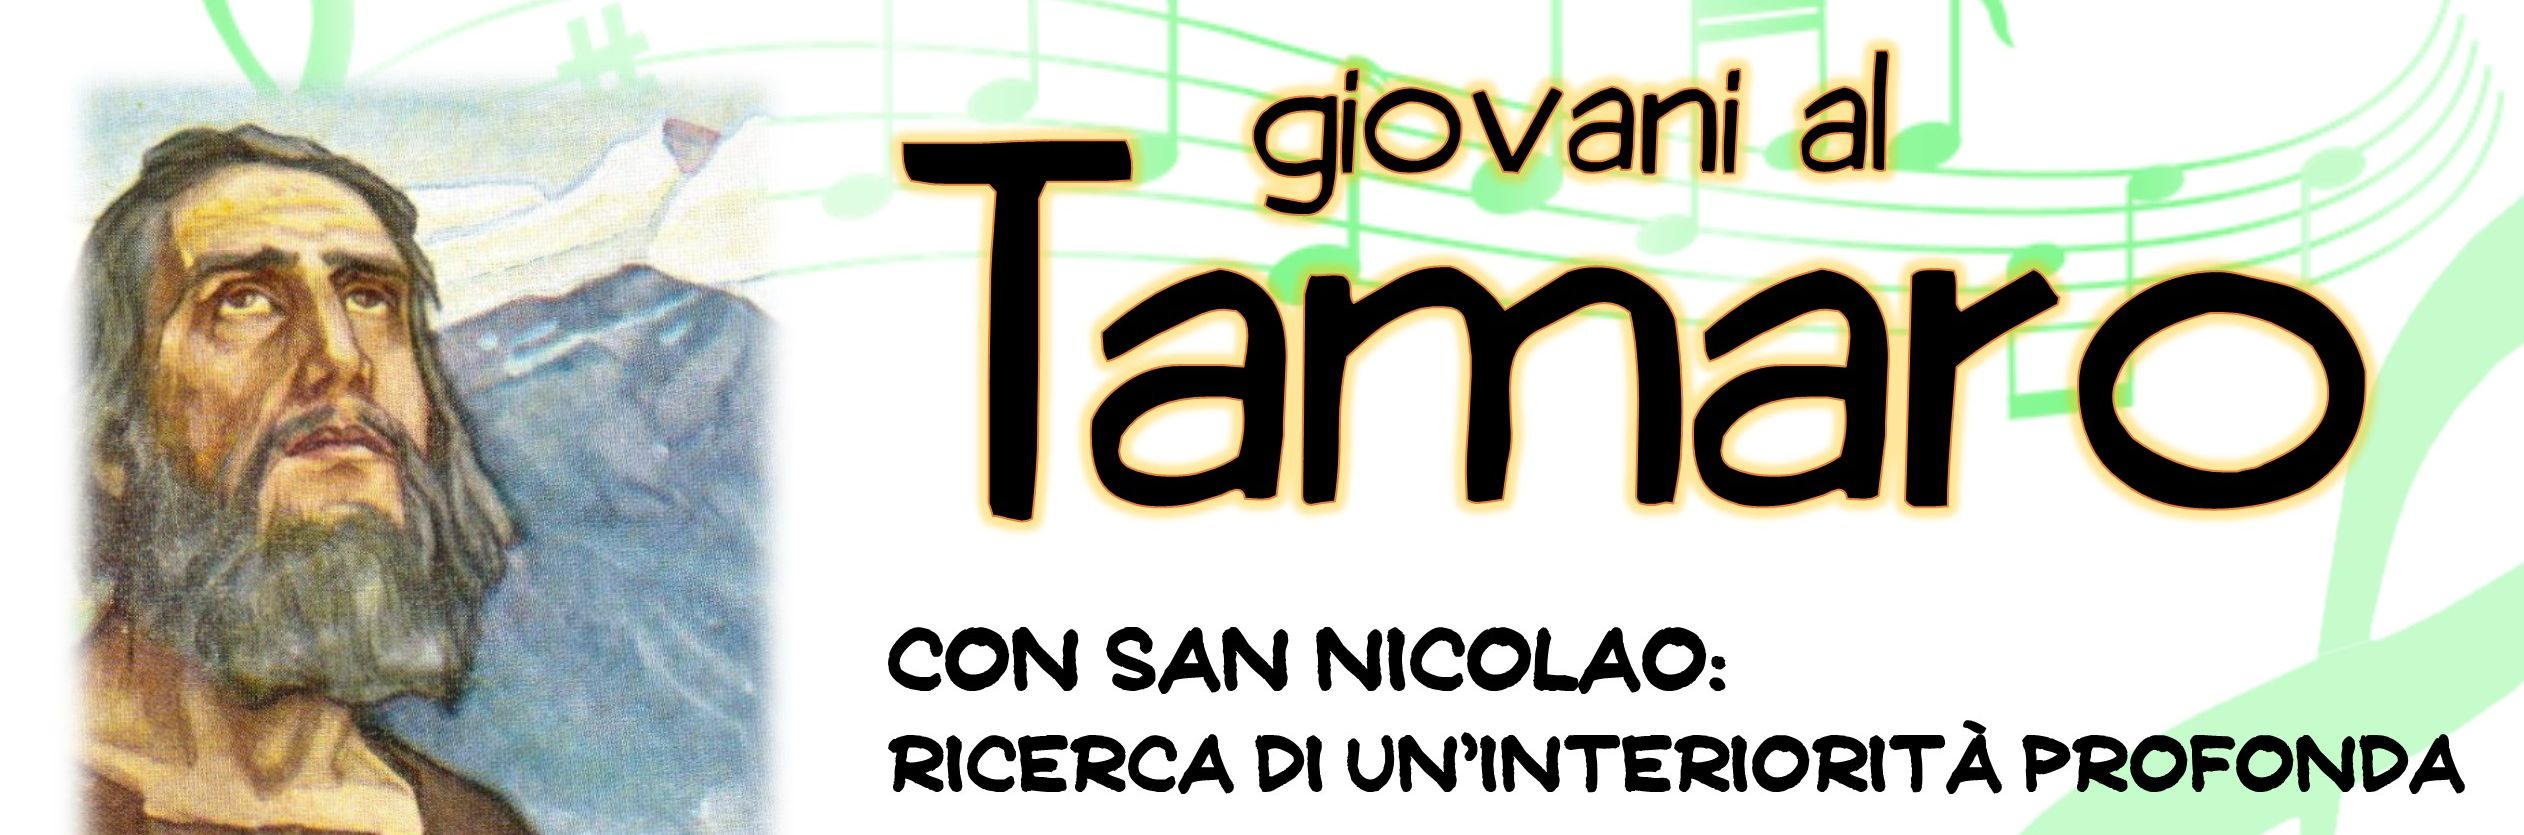 20170207 - tamaro17- F